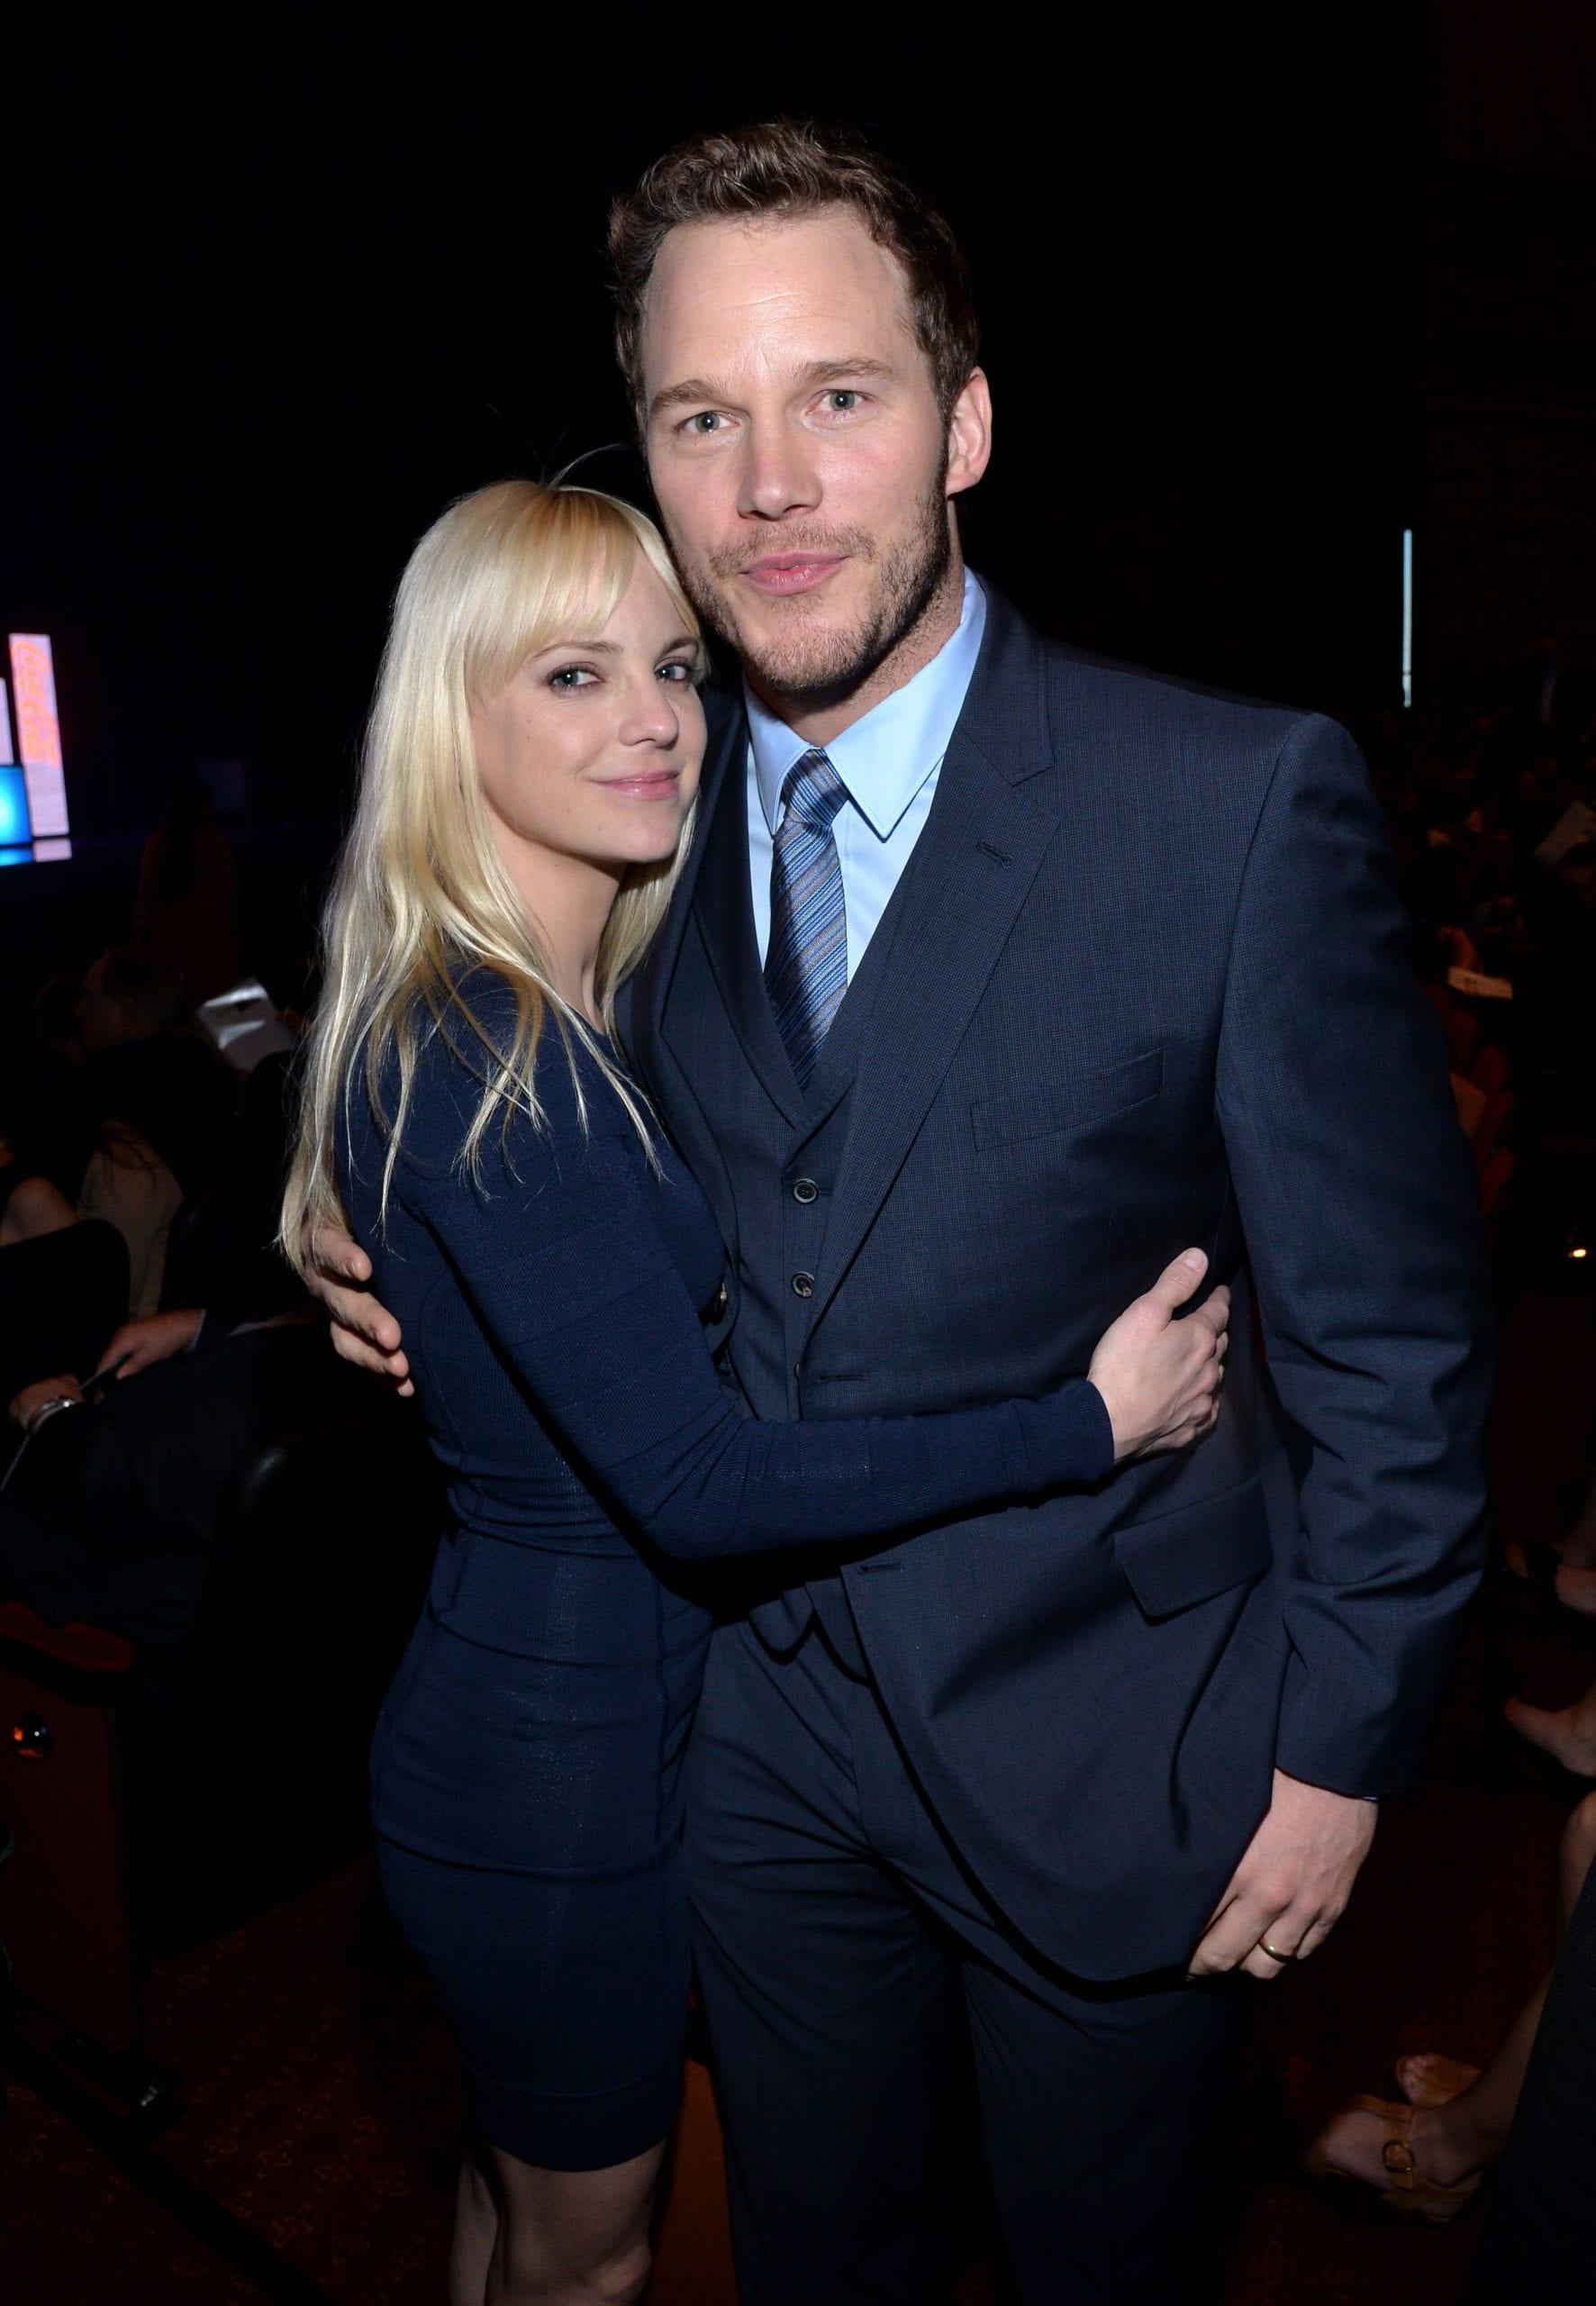 Did Chris Pratt Cheat On Anna Faris?